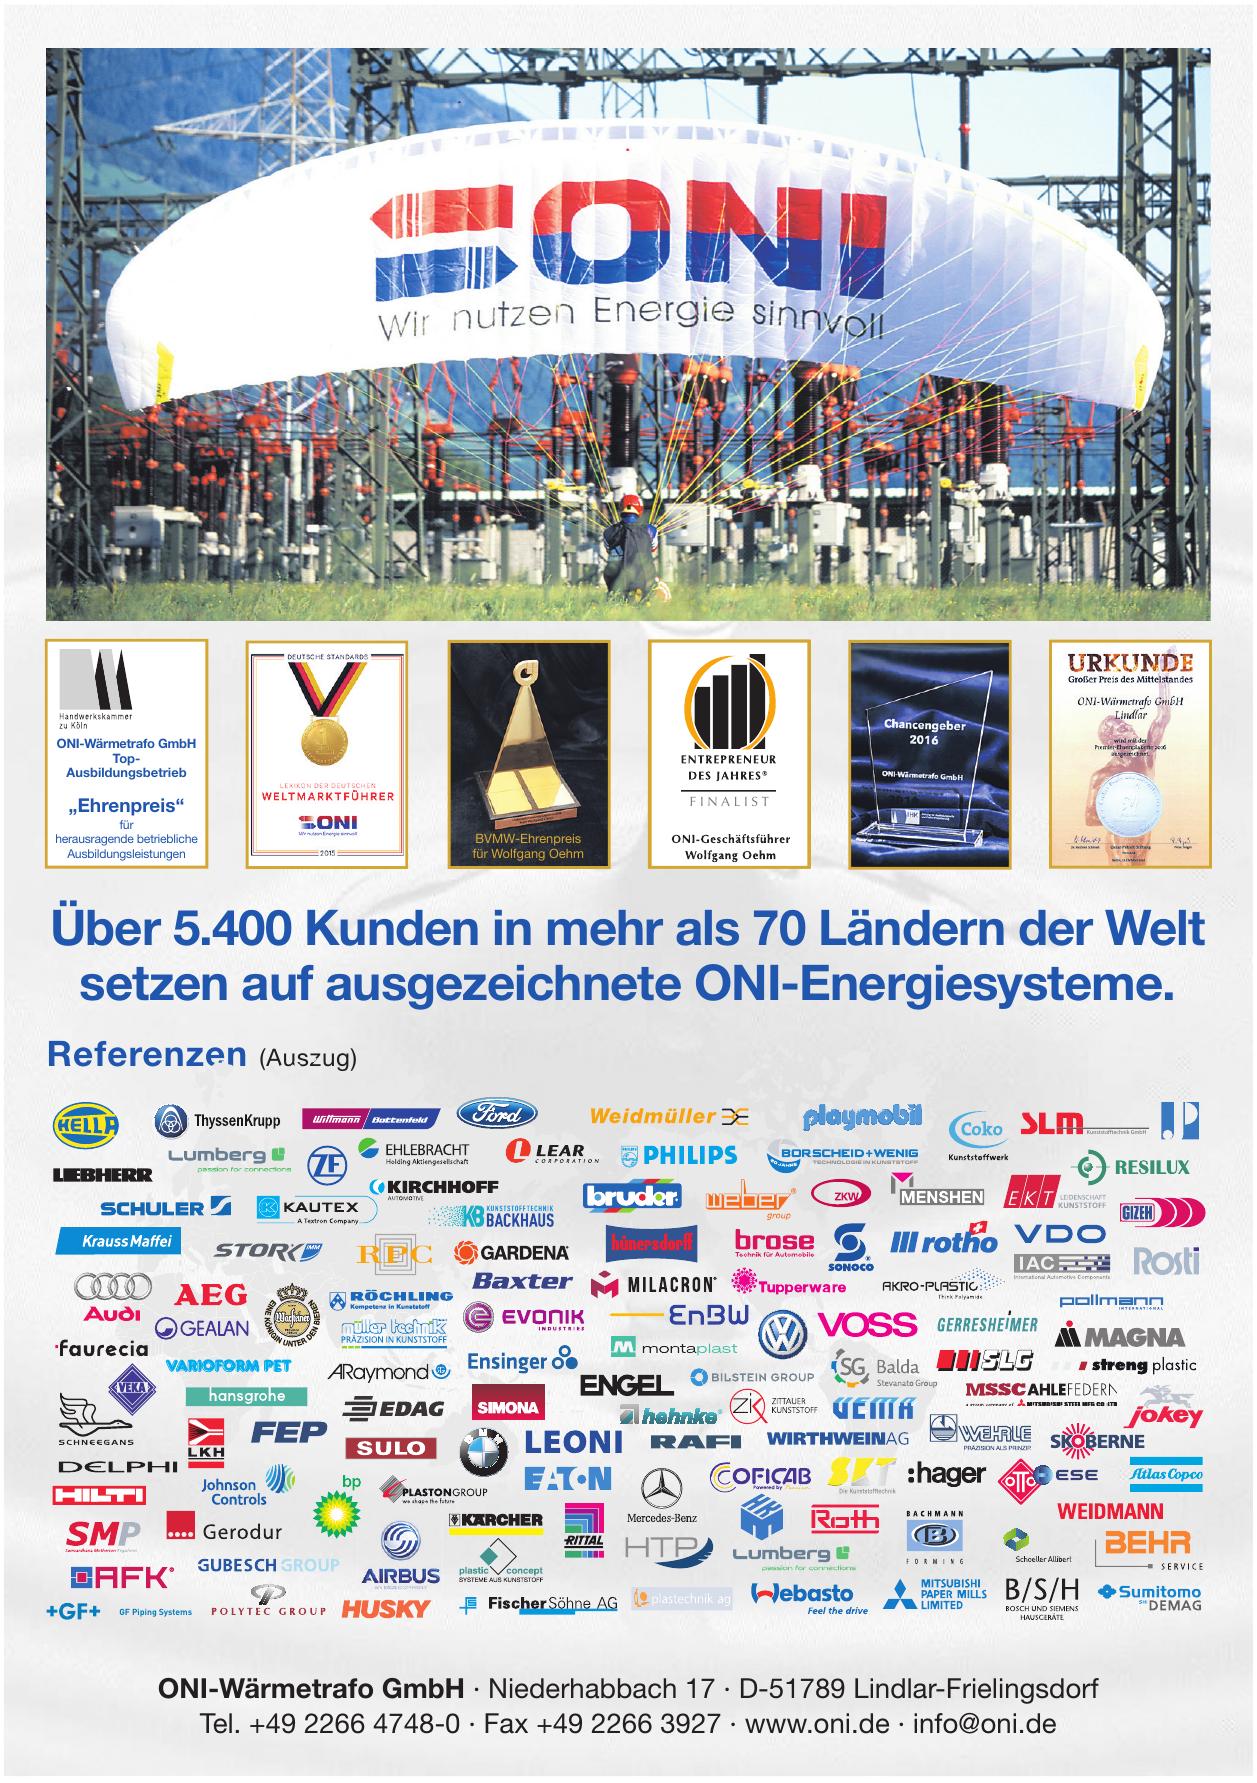 ONI-Wärmetrafo GmbH